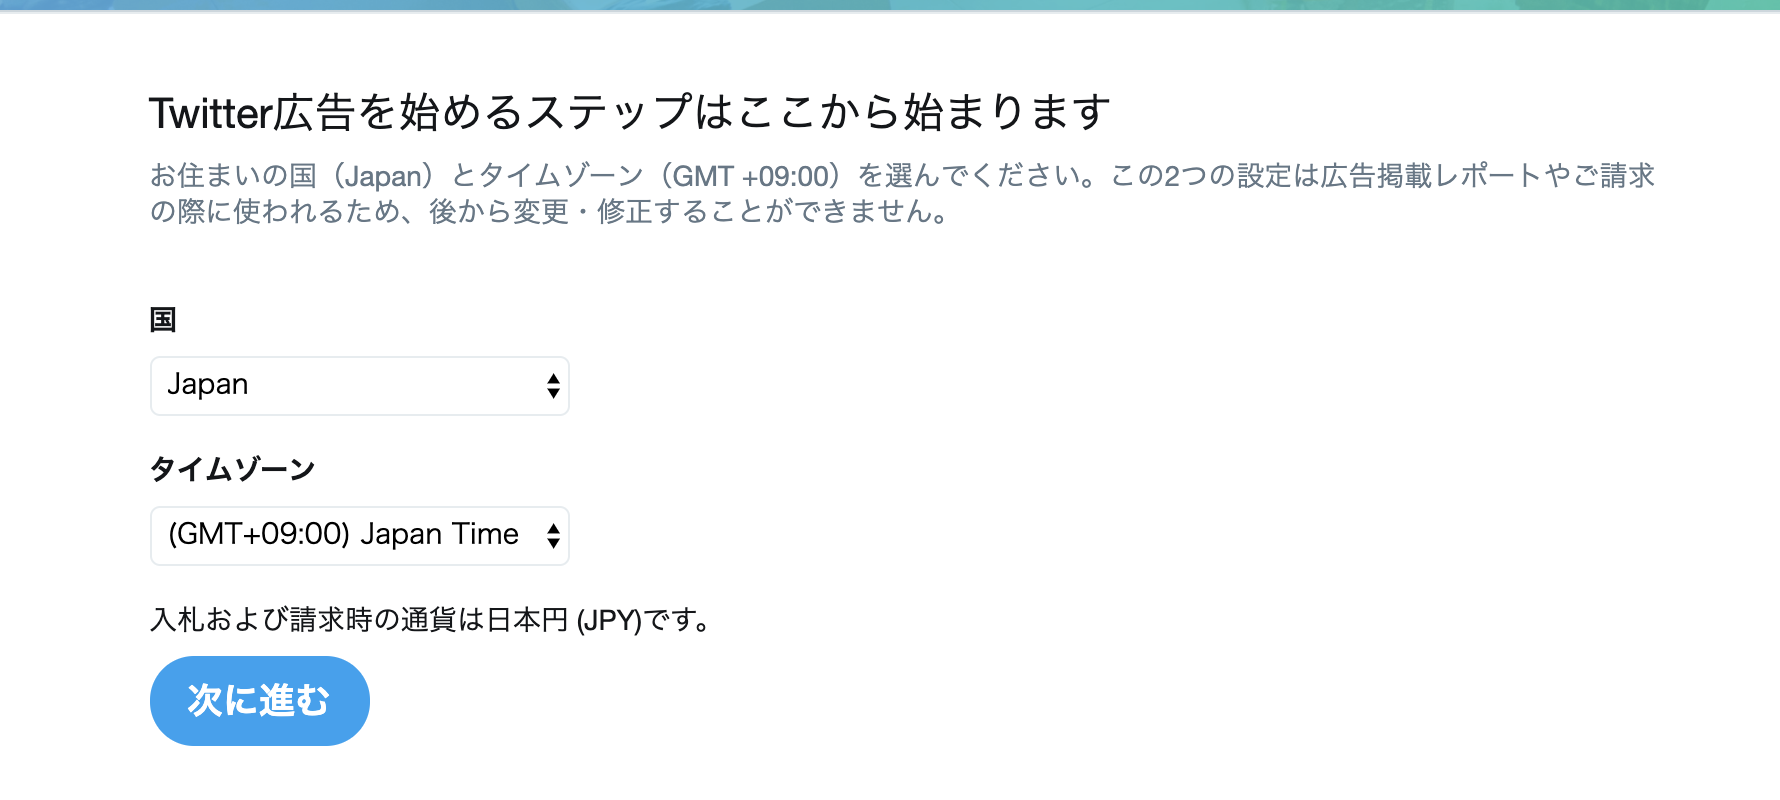 Twitter広告_アカウント登録_国